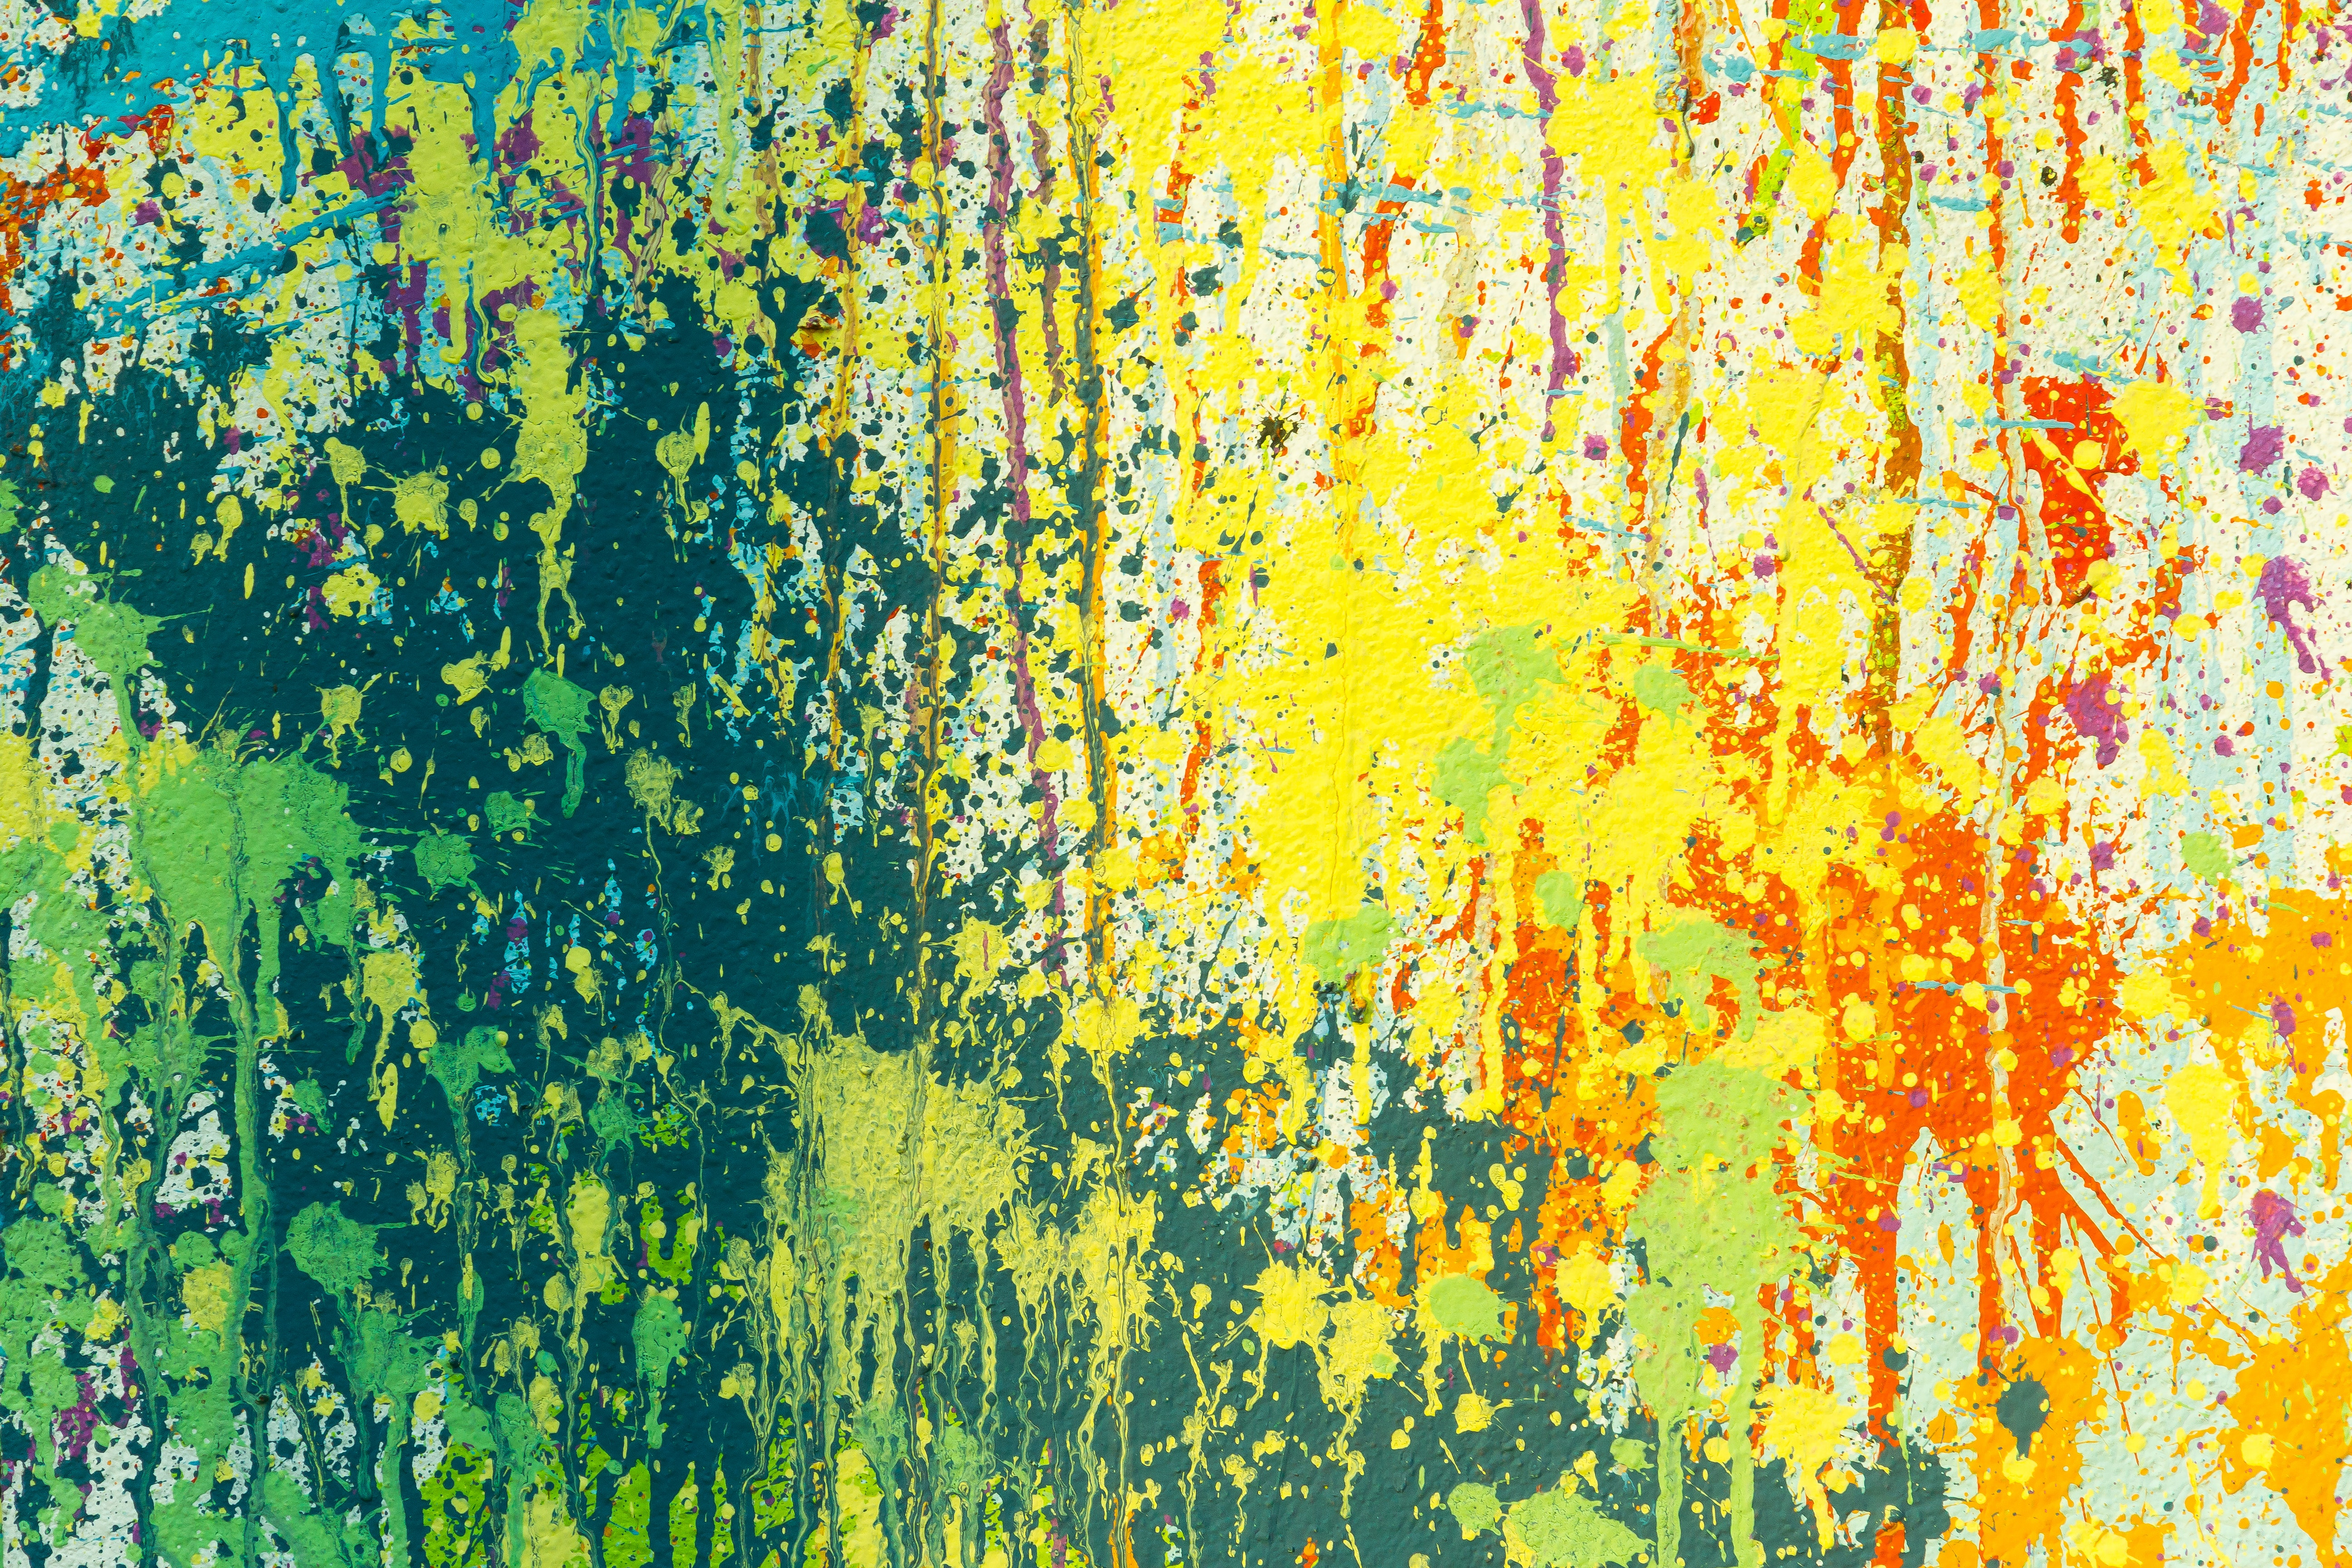 500+ Great Paint Splatter Photos · Pexels · Free Stock Photos